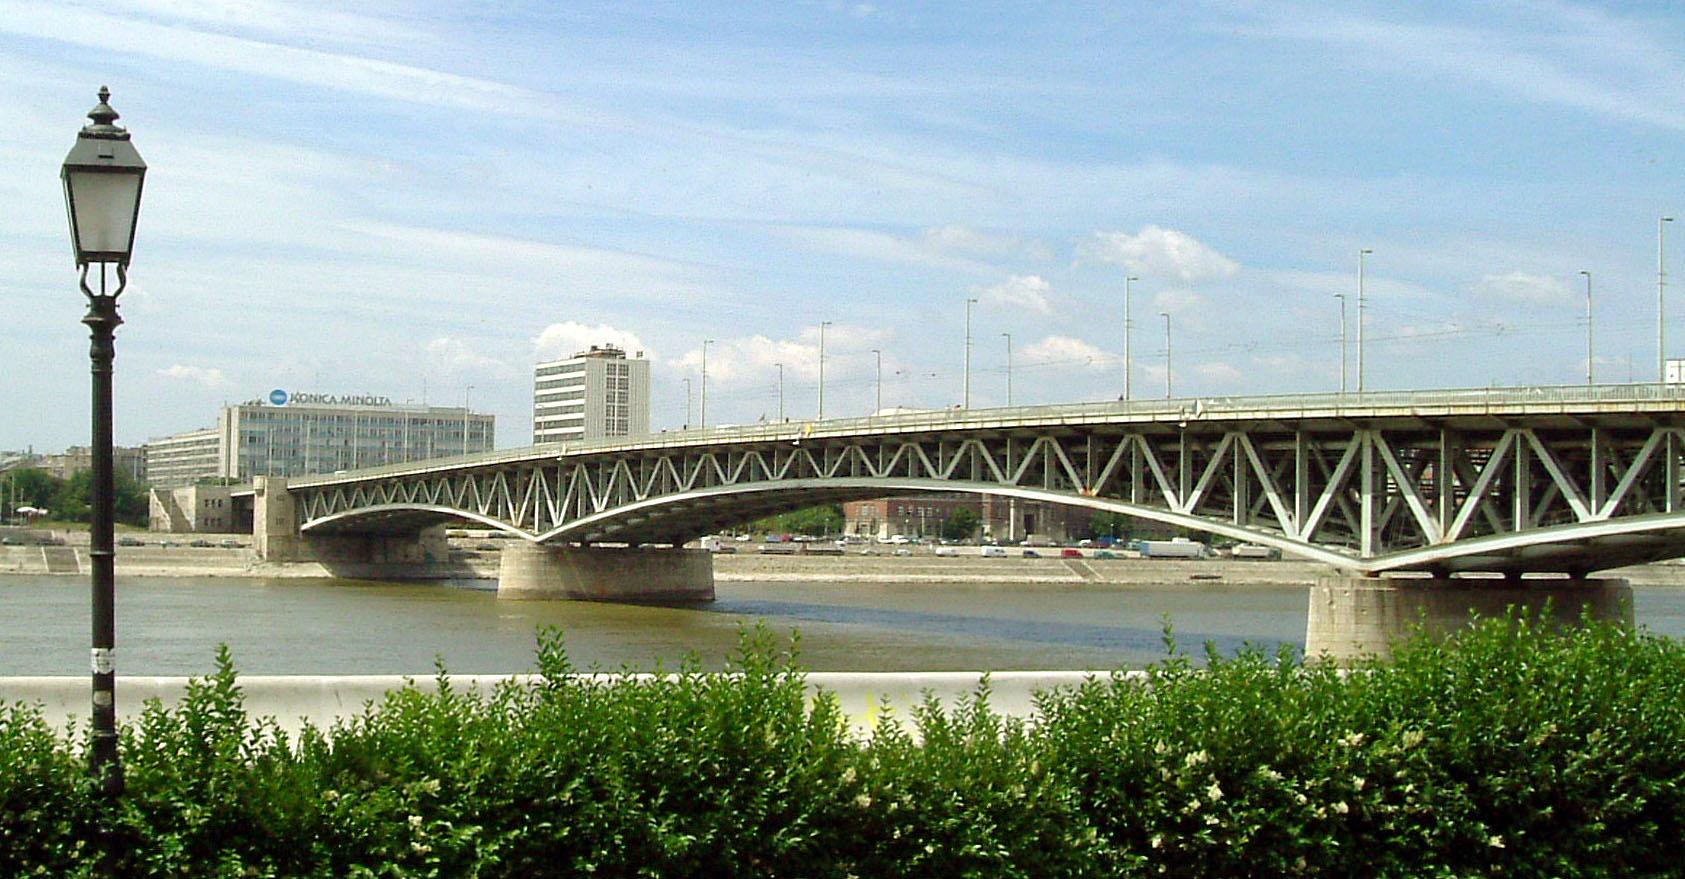 budapest_petofi_bridge.jpg